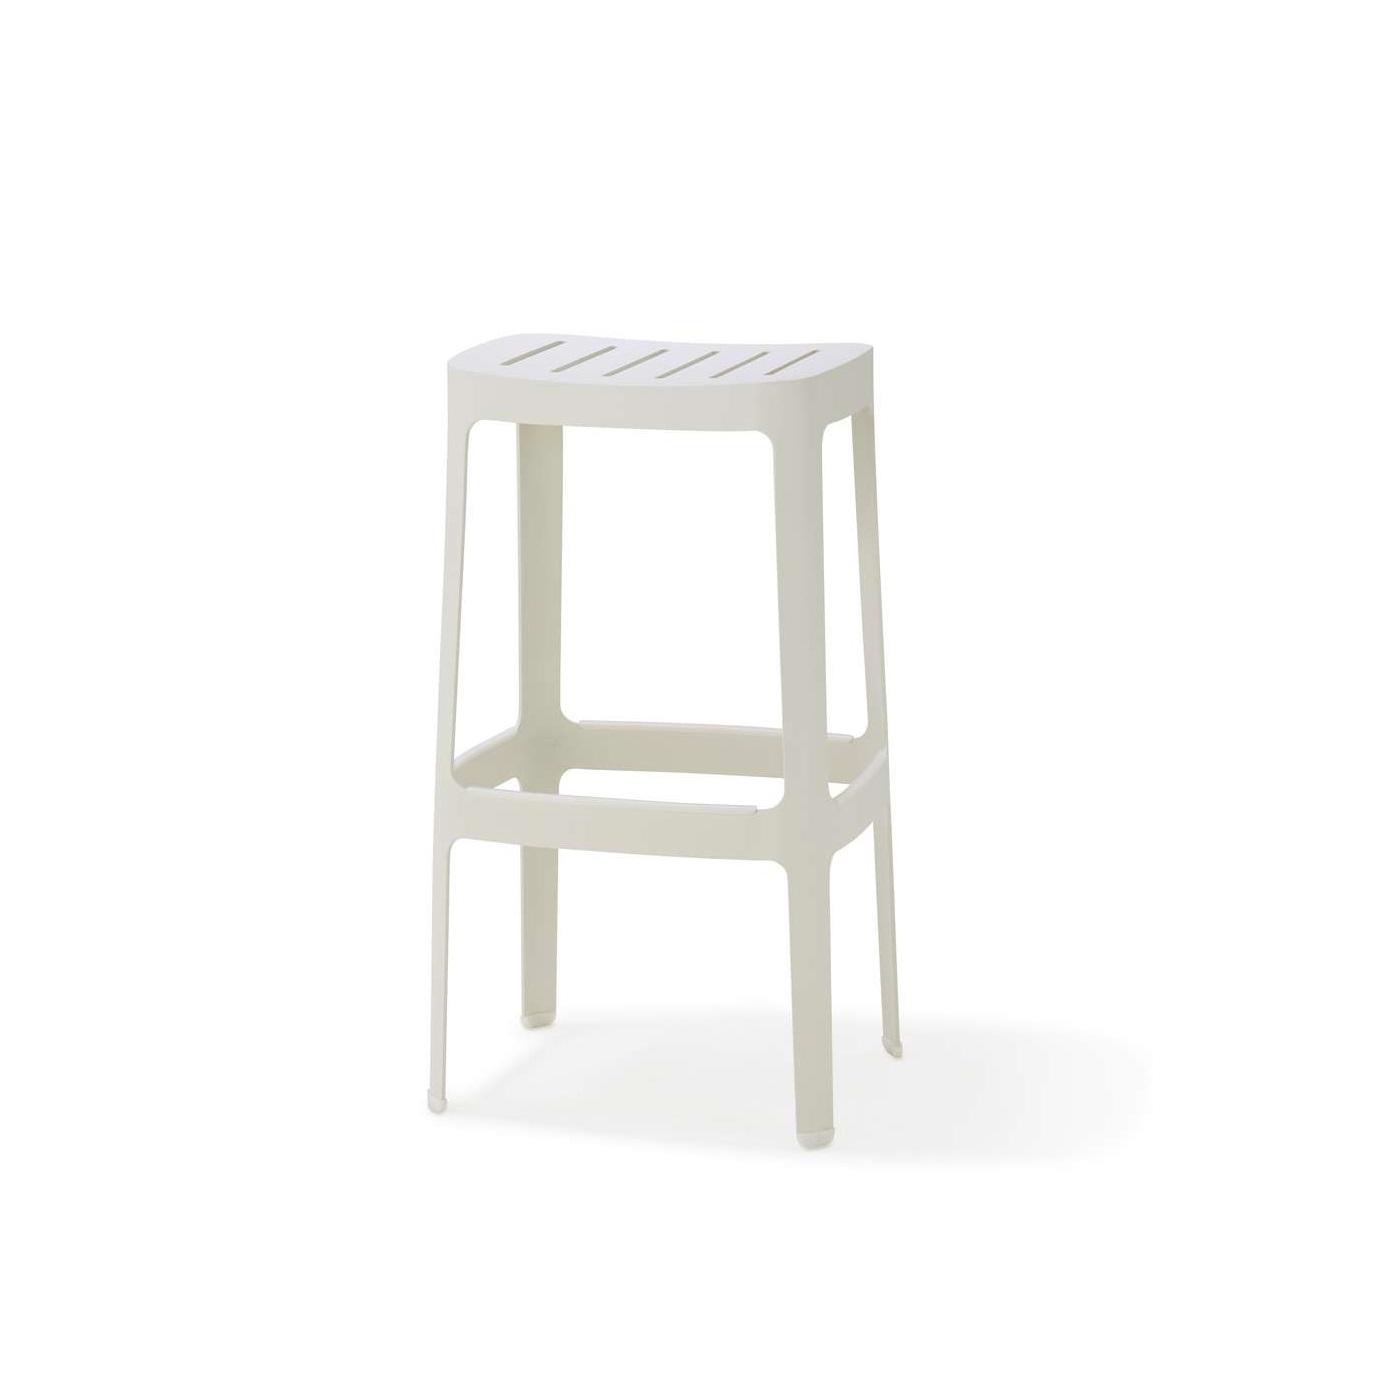 Cut hög barstol 76 cm vit, Cane-line